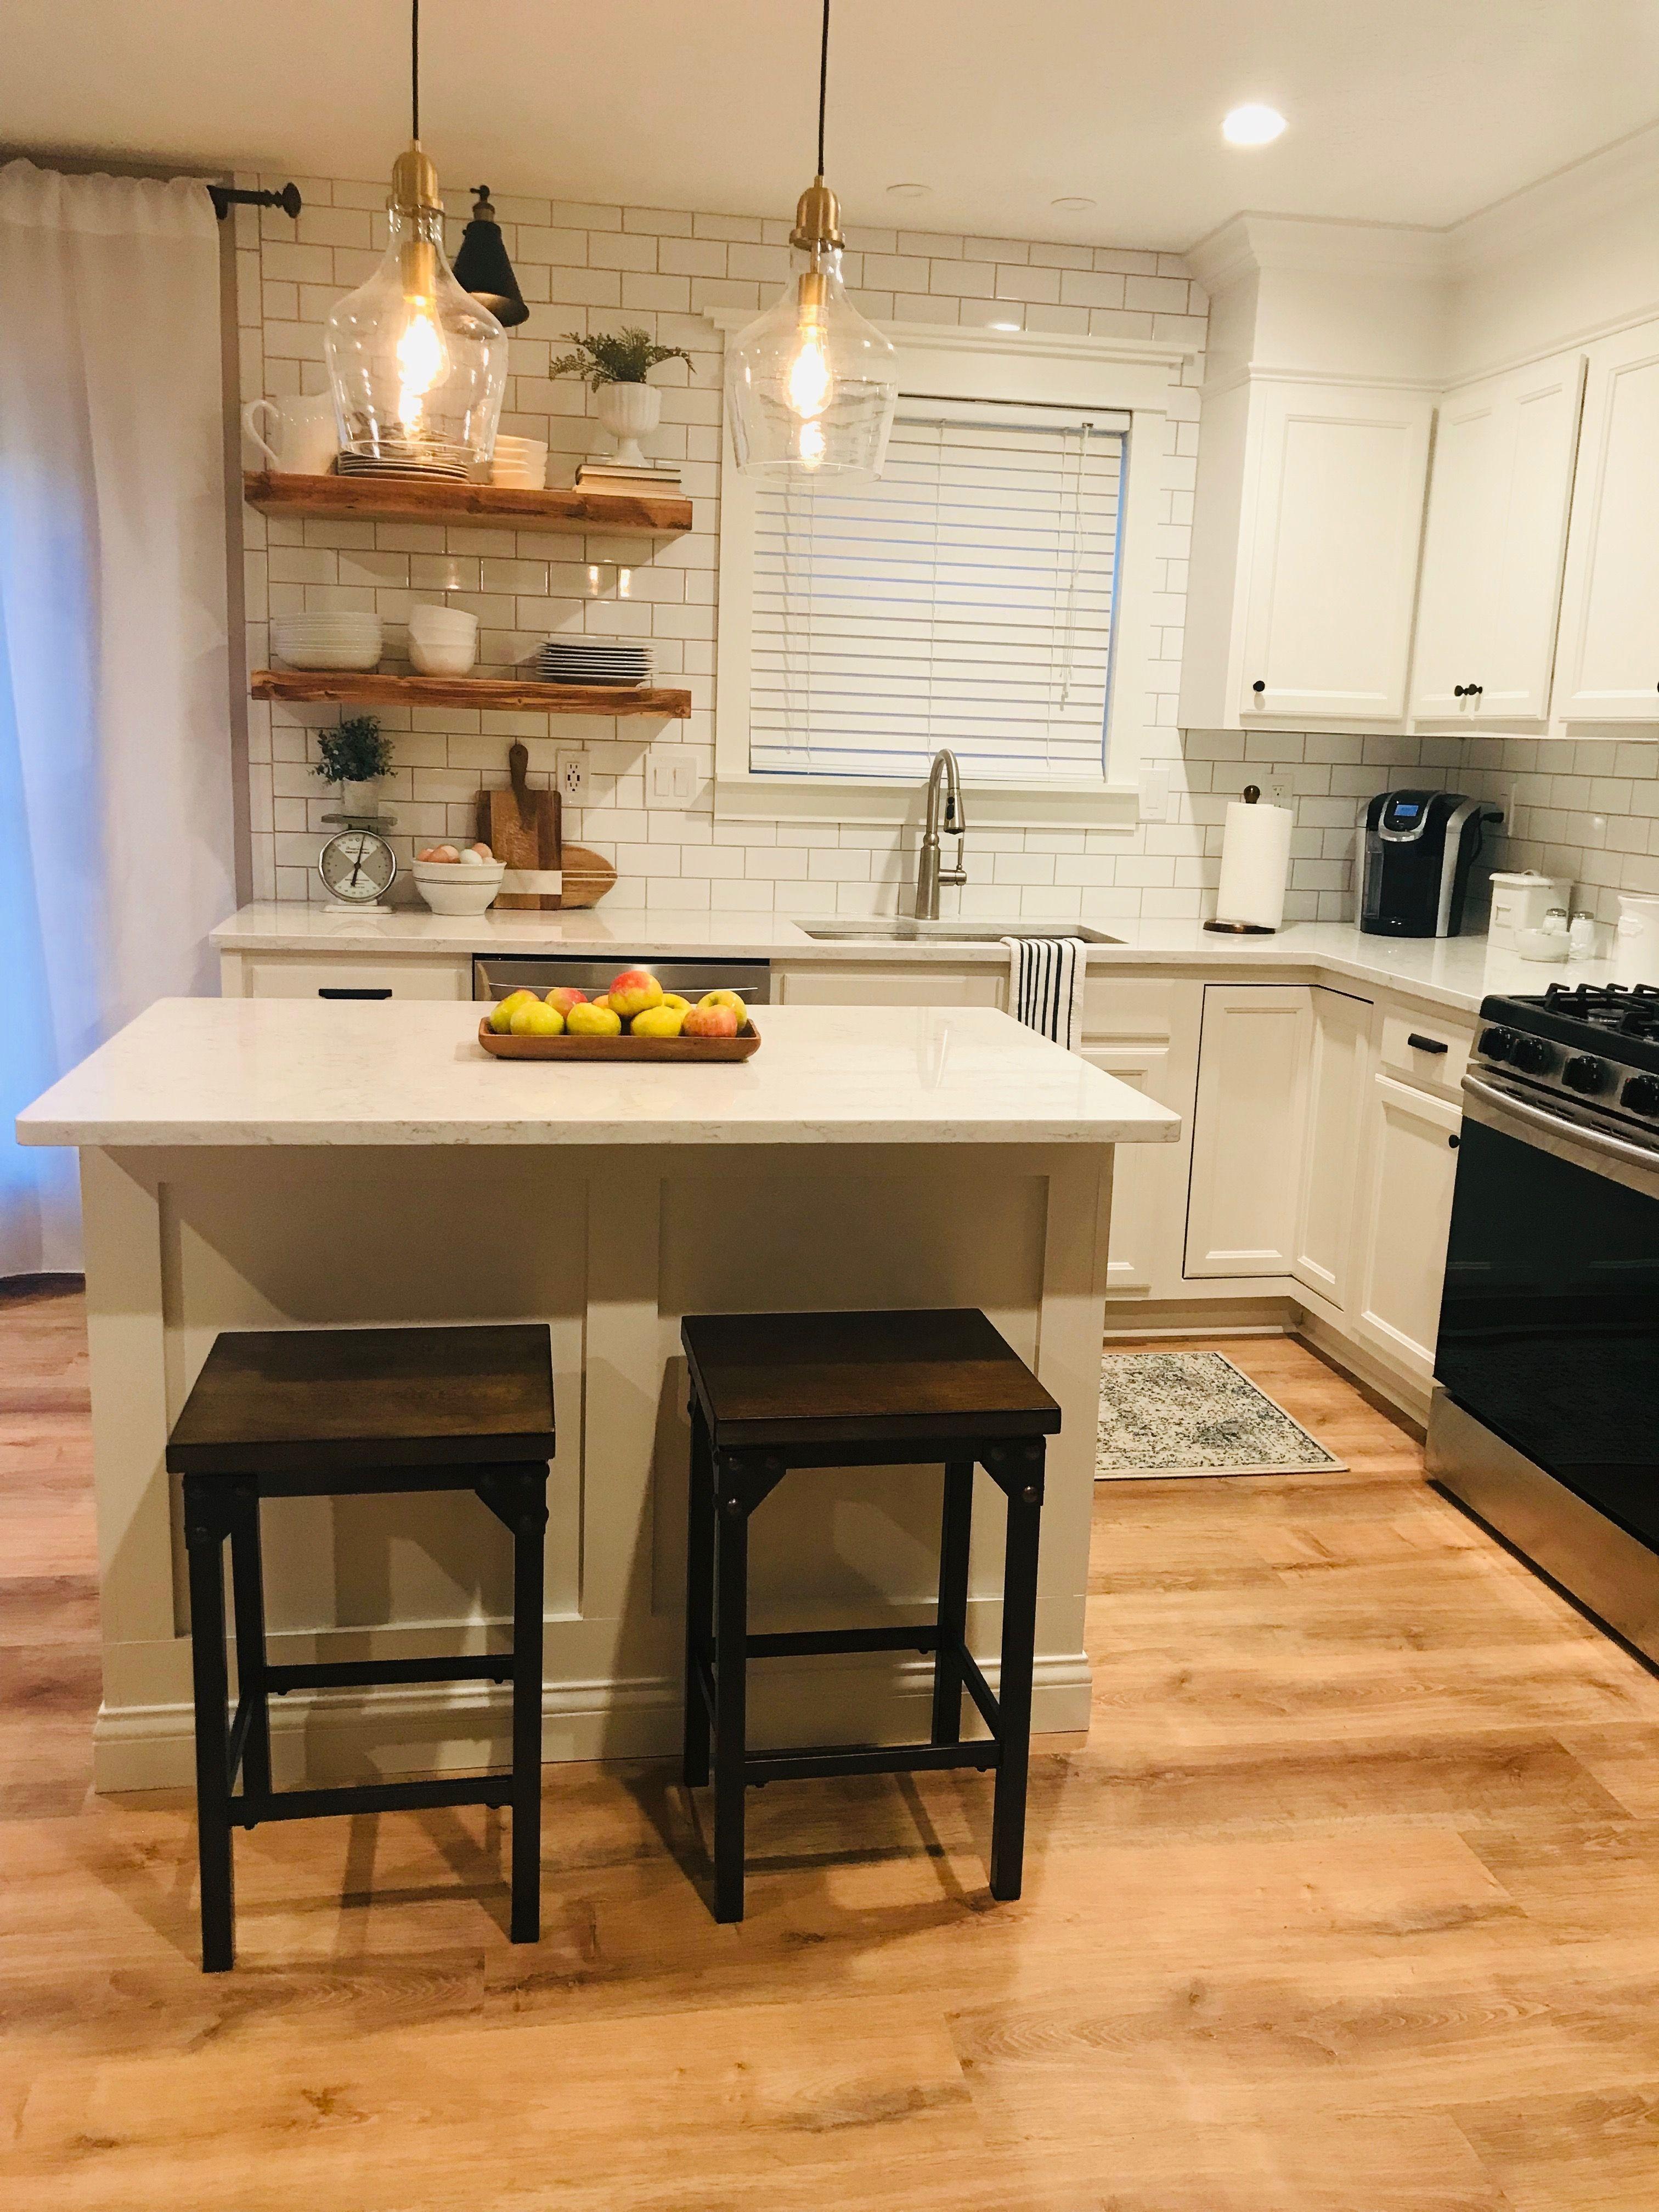 Flooring is home depots lifeproof vinyl in fresh oak